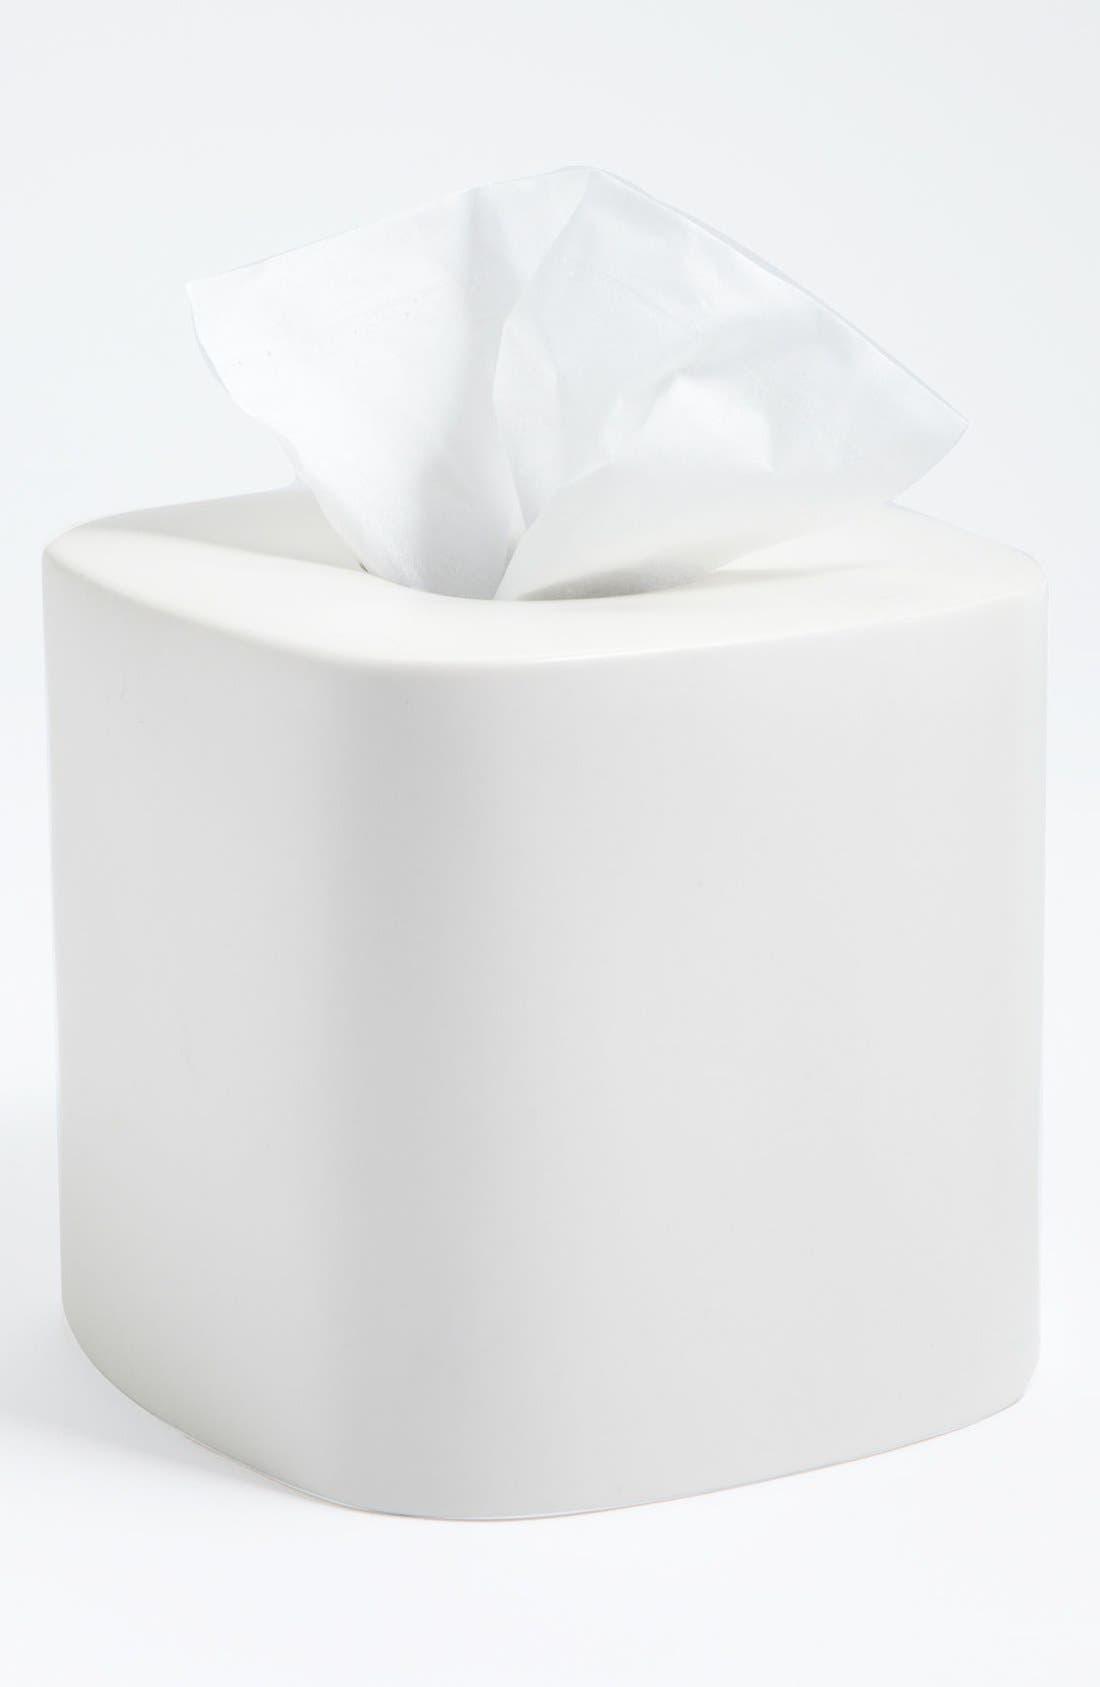 Main Image - Waterworks Studio 'Modern' Ceramic Tissue Cover (Online Only)